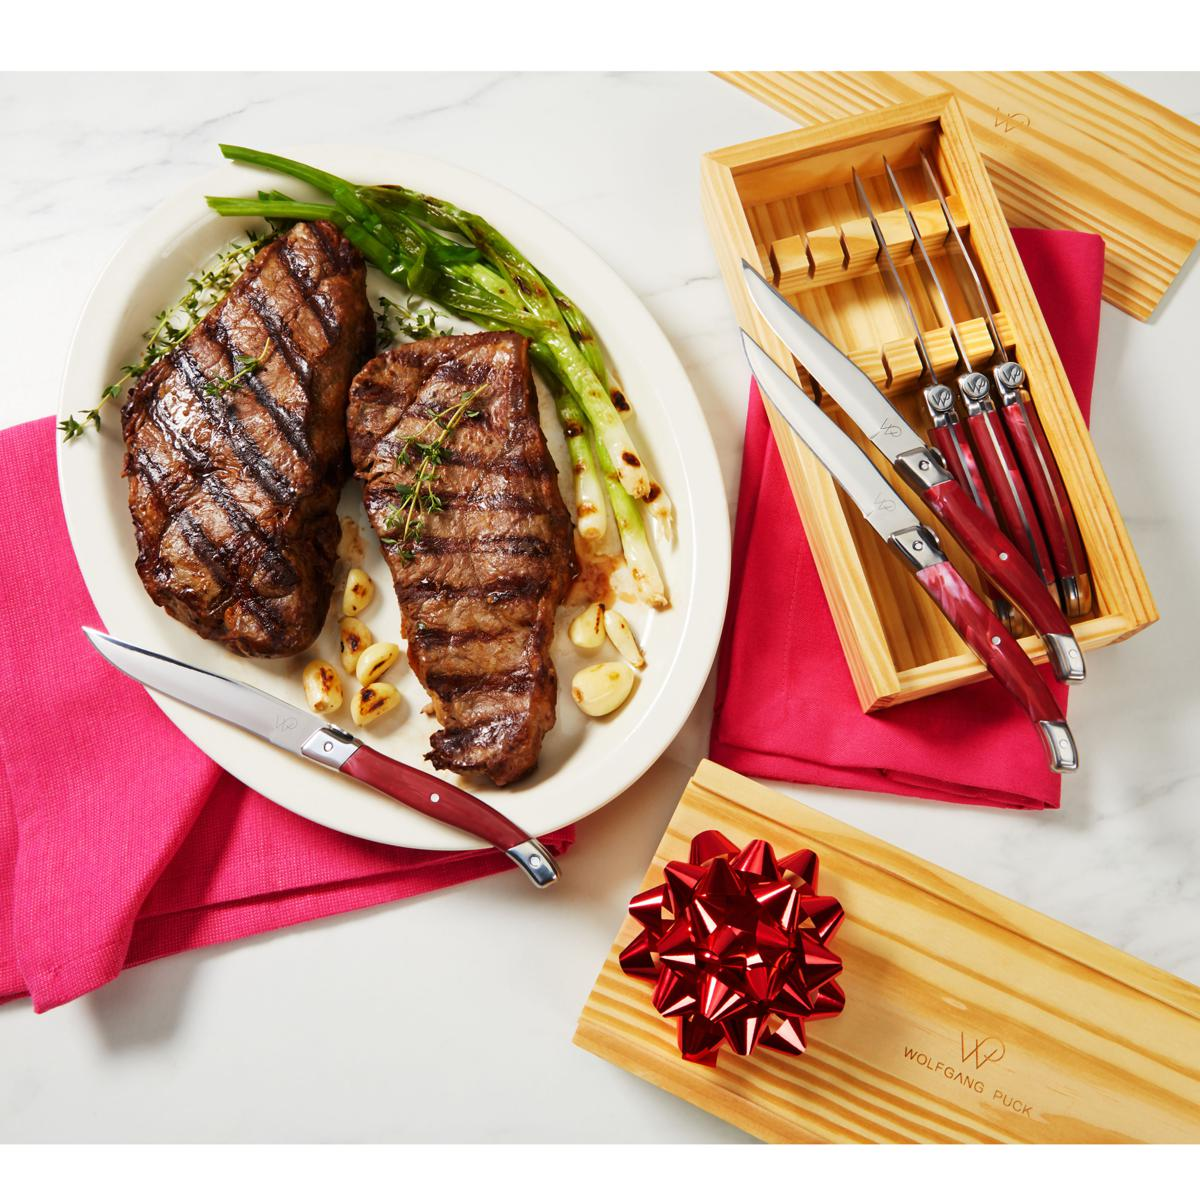 Wolfgang Puck 12pc Carbon Steel Steak Knife Set W Wood